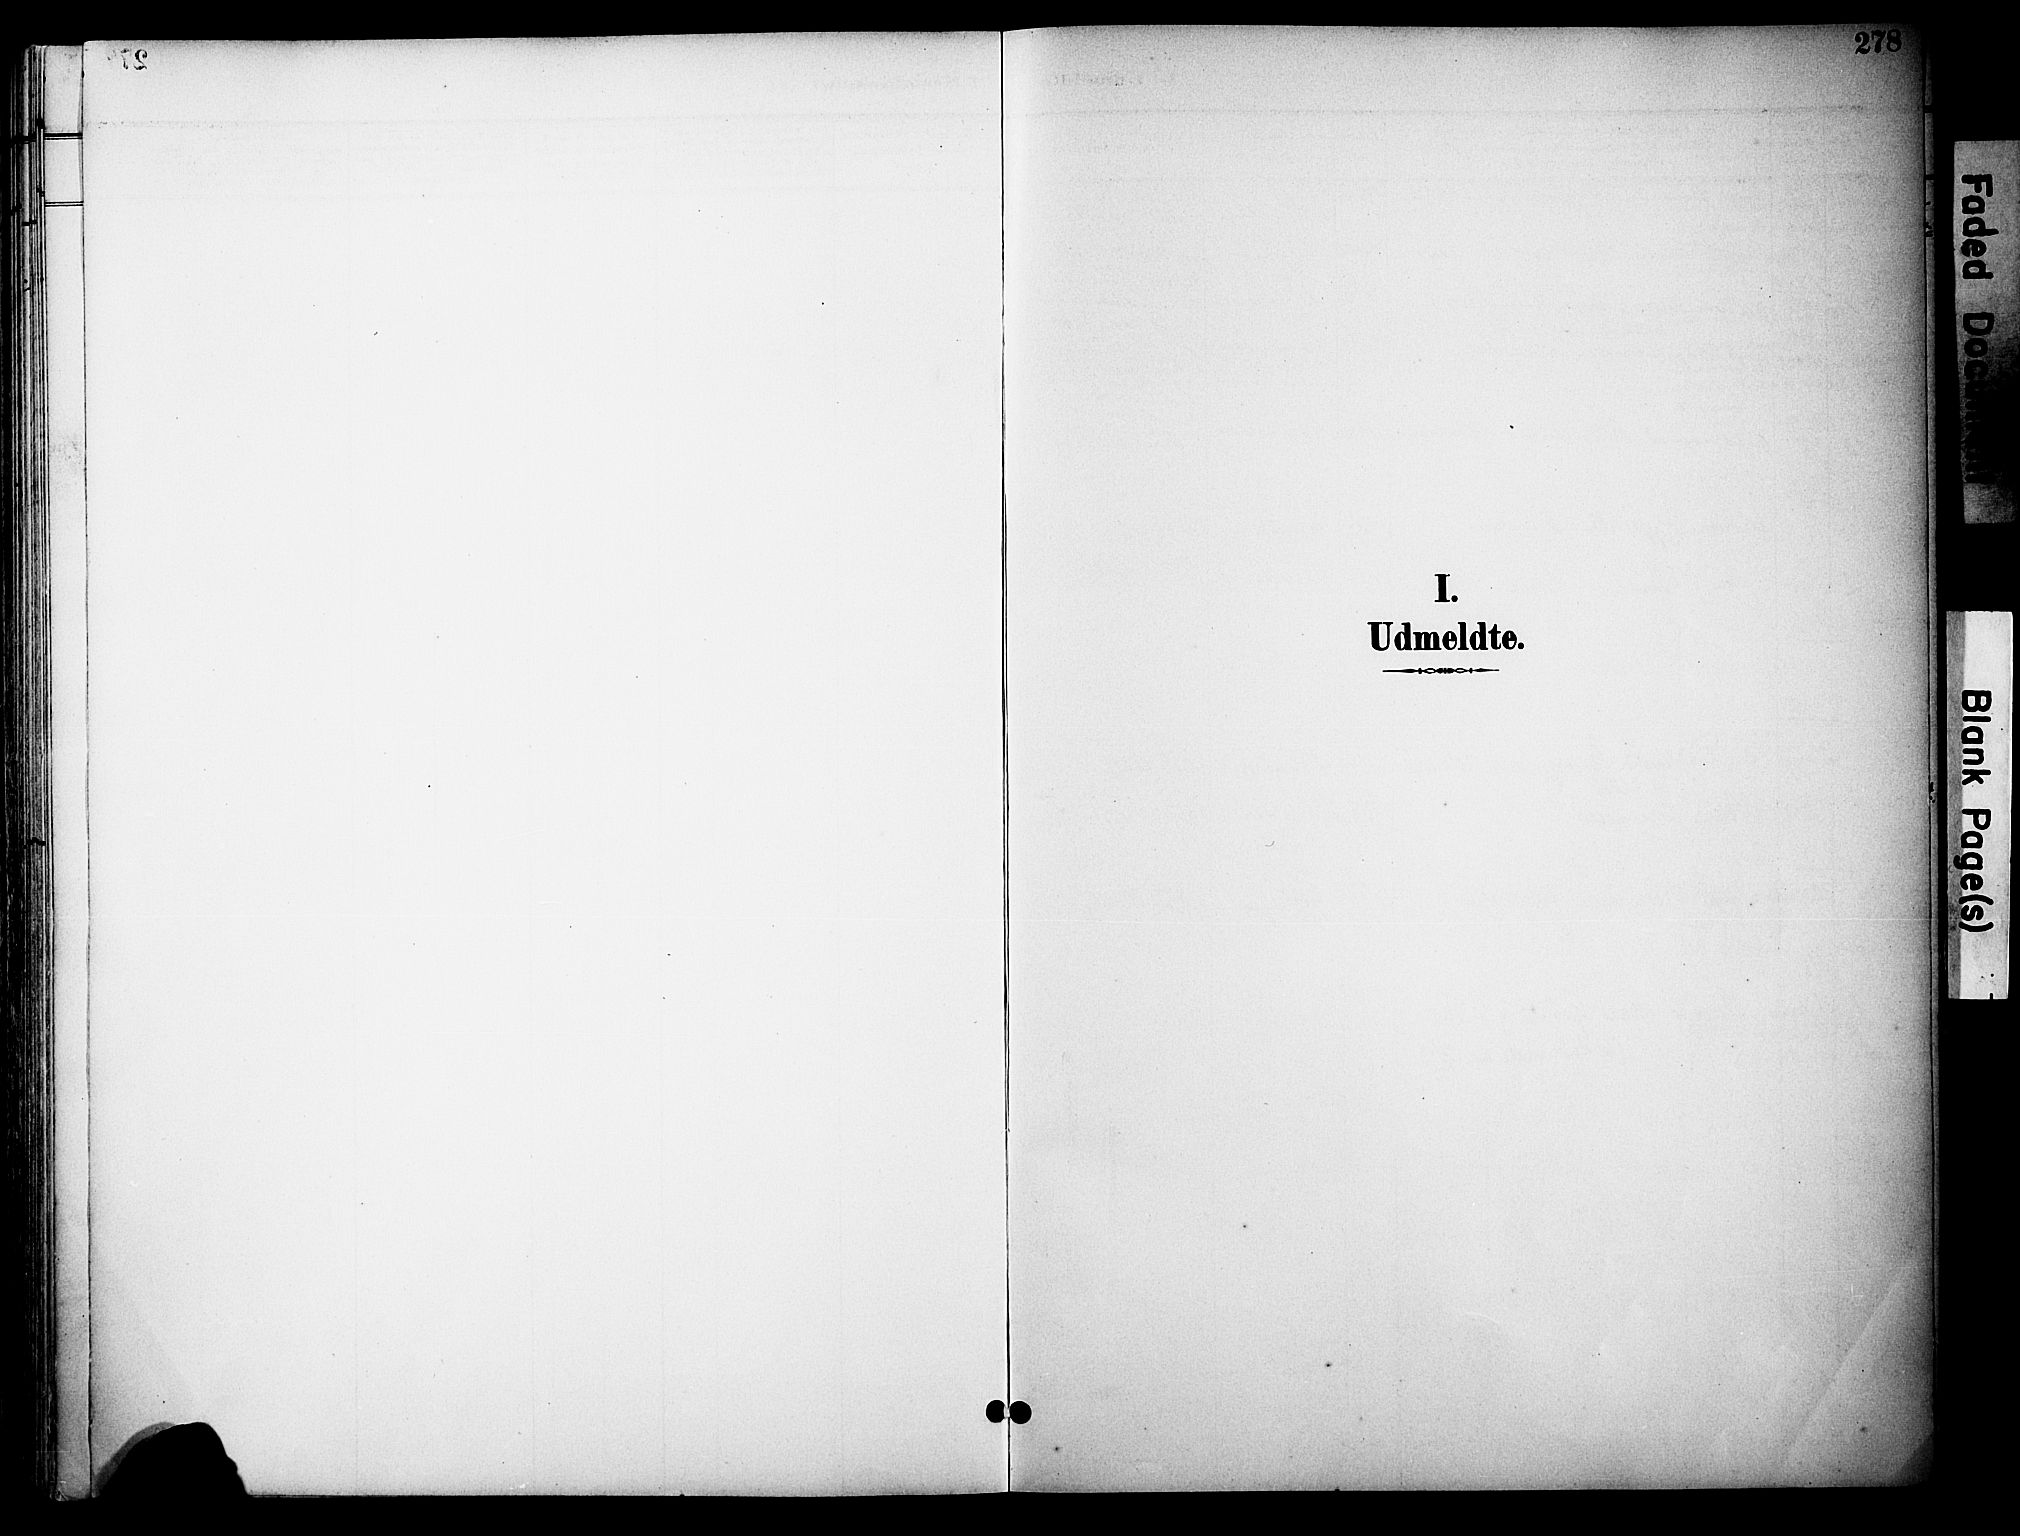 SAH, Østre Toten prestekontor, Ministerialbok nr. 9, 1897-1913, s. 278